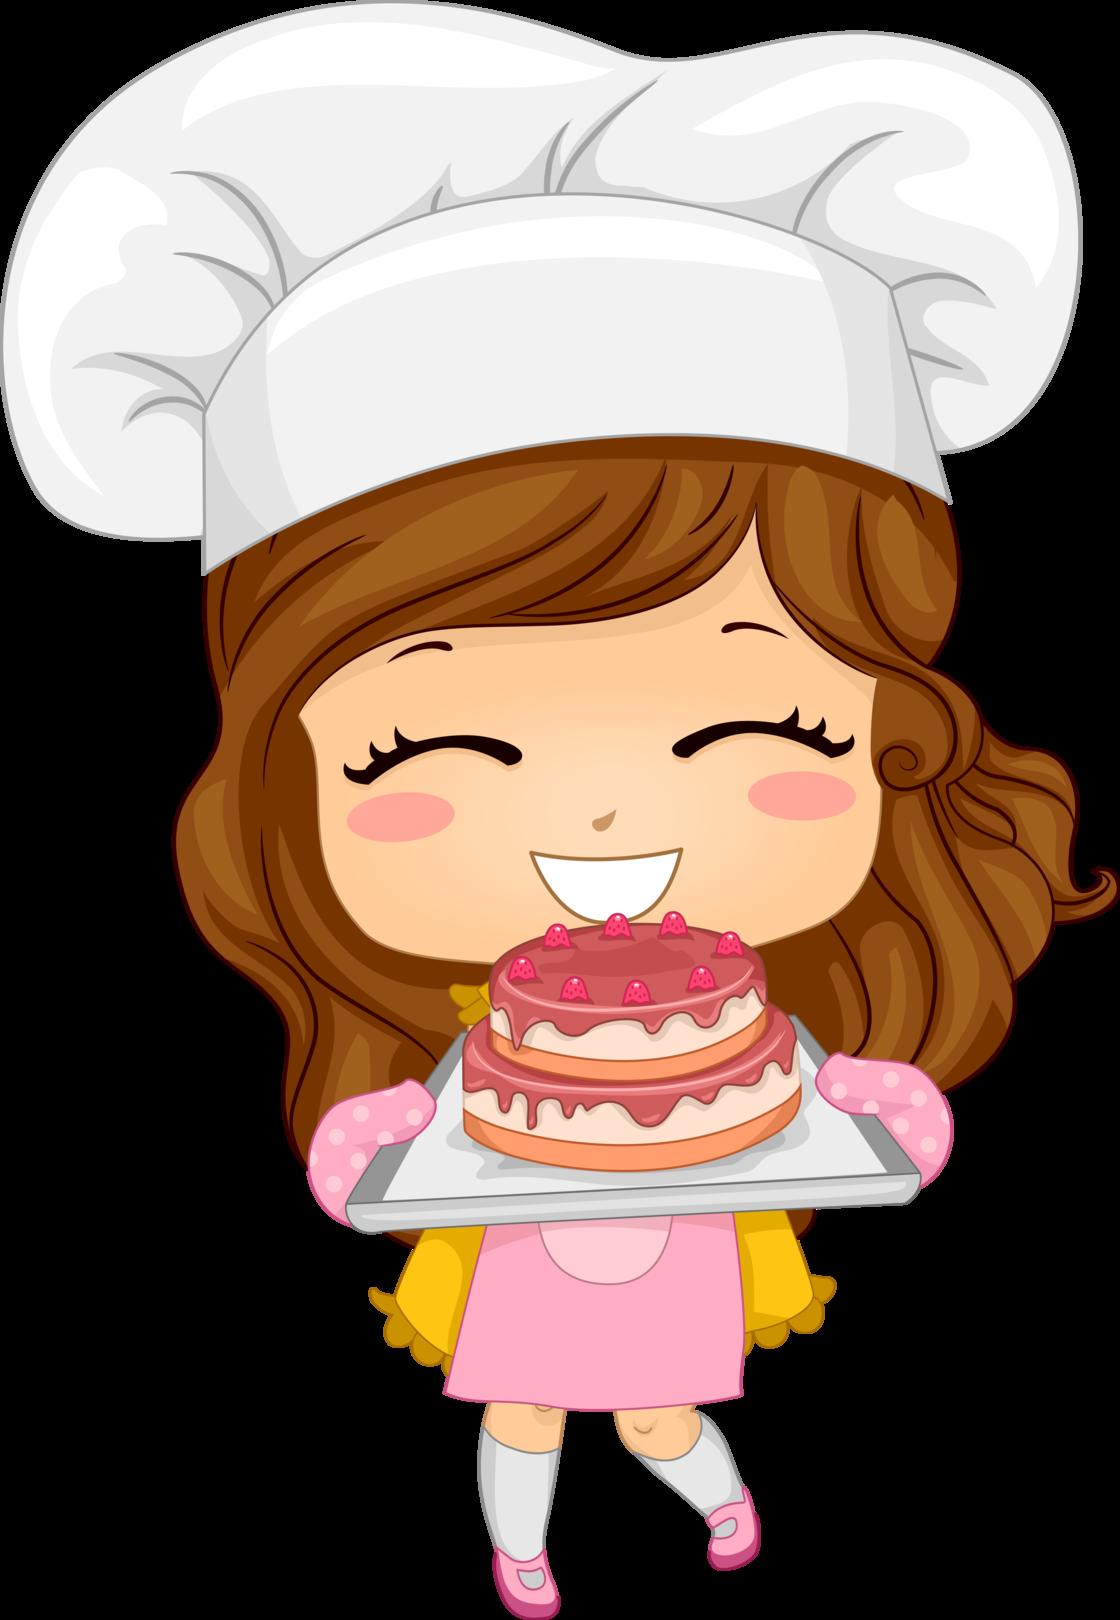 Female clipart baking. Classy cakes cookies calgary